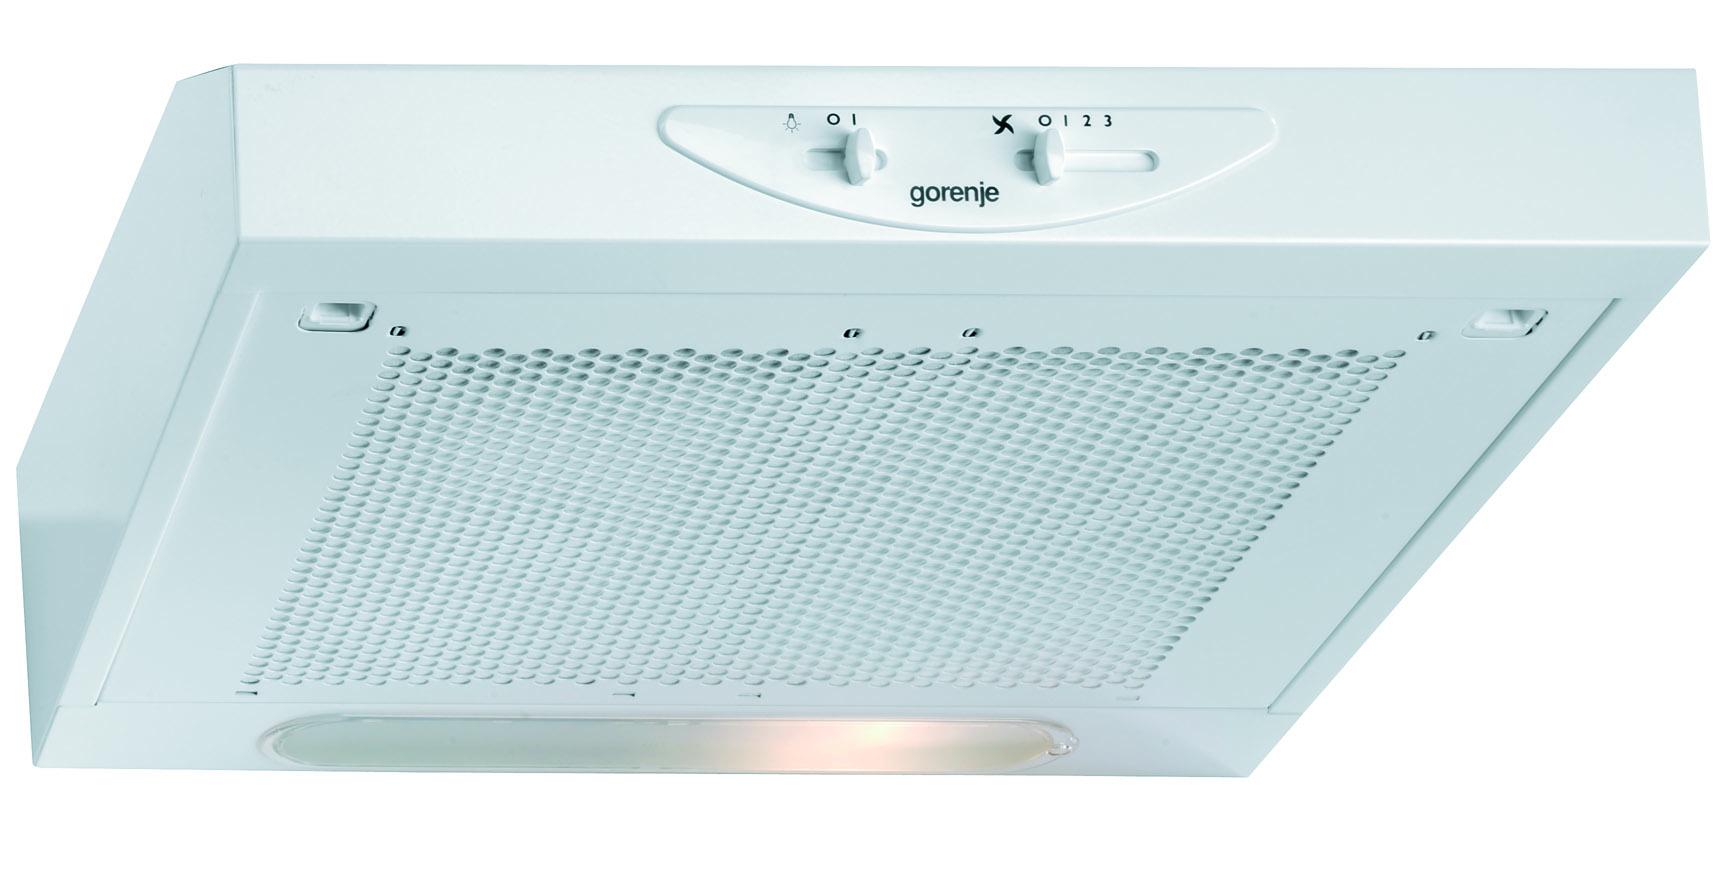 Gorenje DU511W Podugradni kuhinjski aspirator